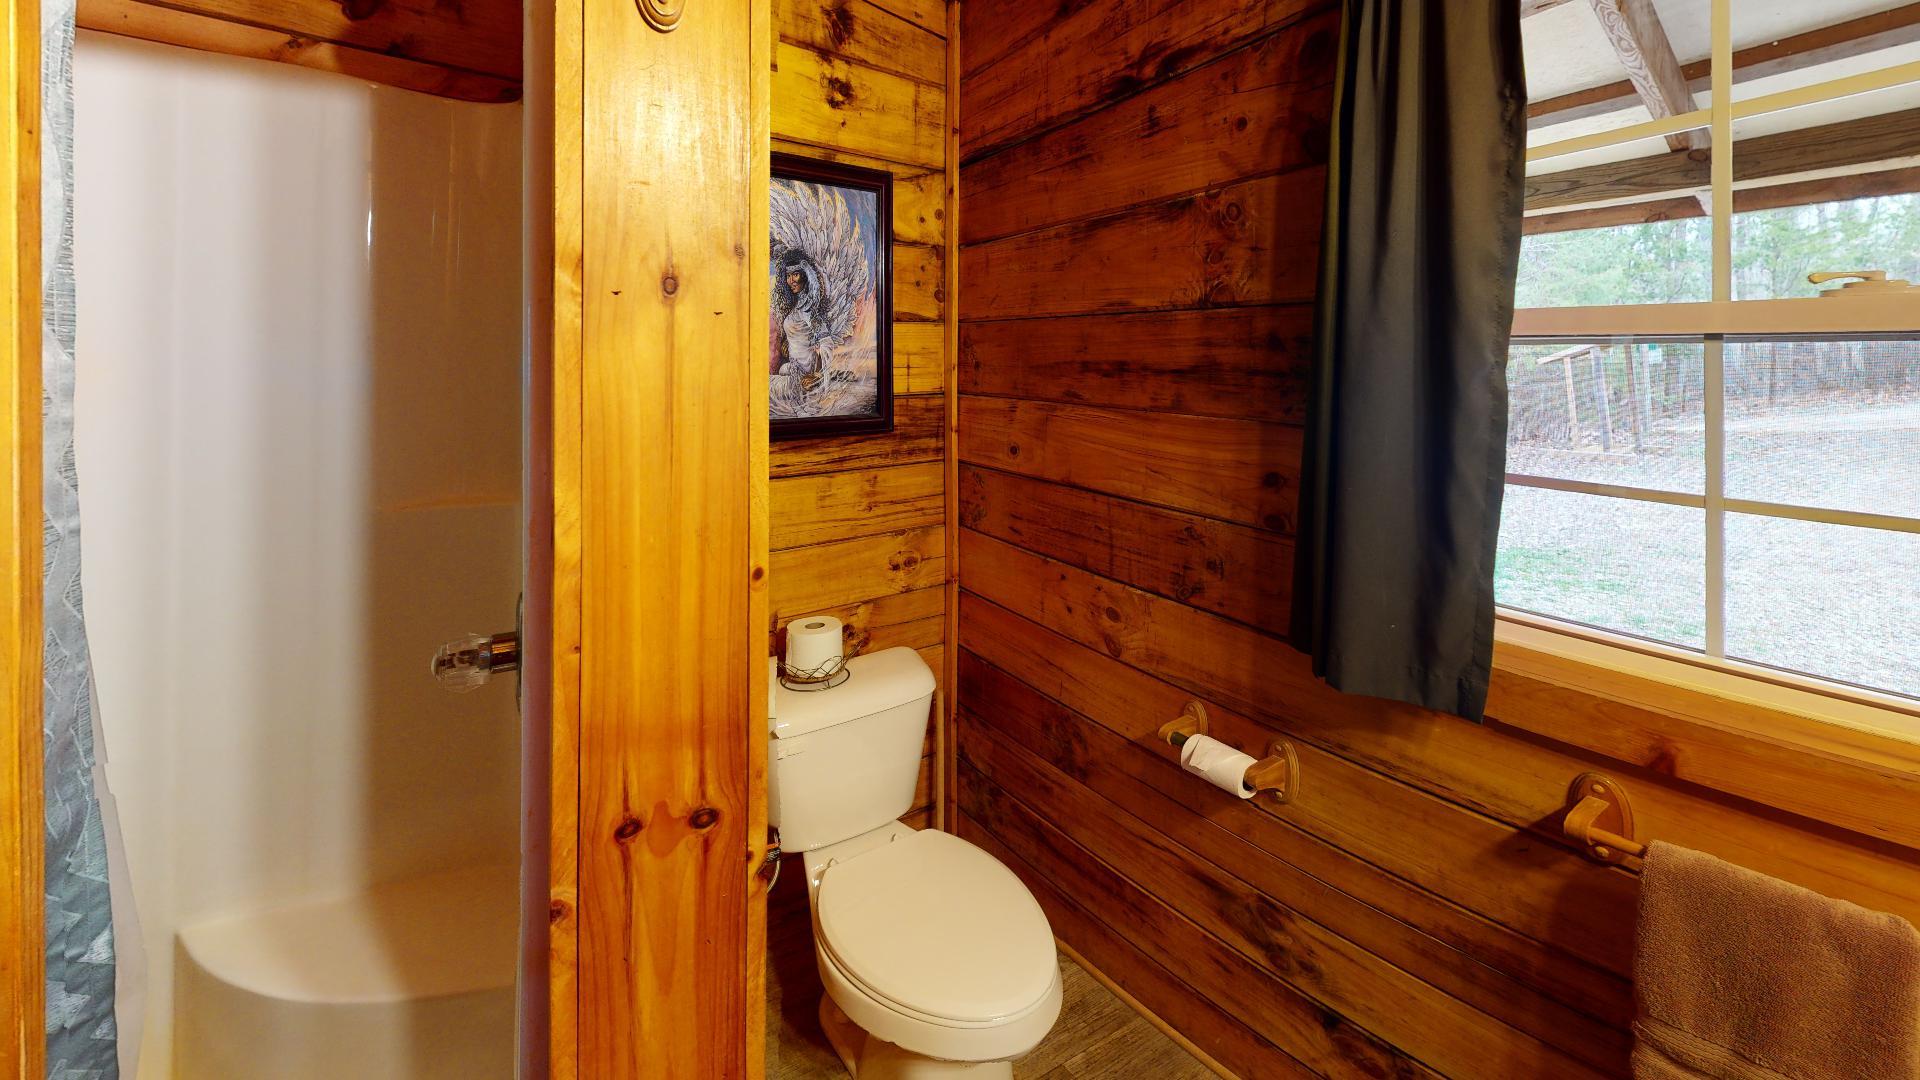 The Lakota - Walk in shower and bathroom view.